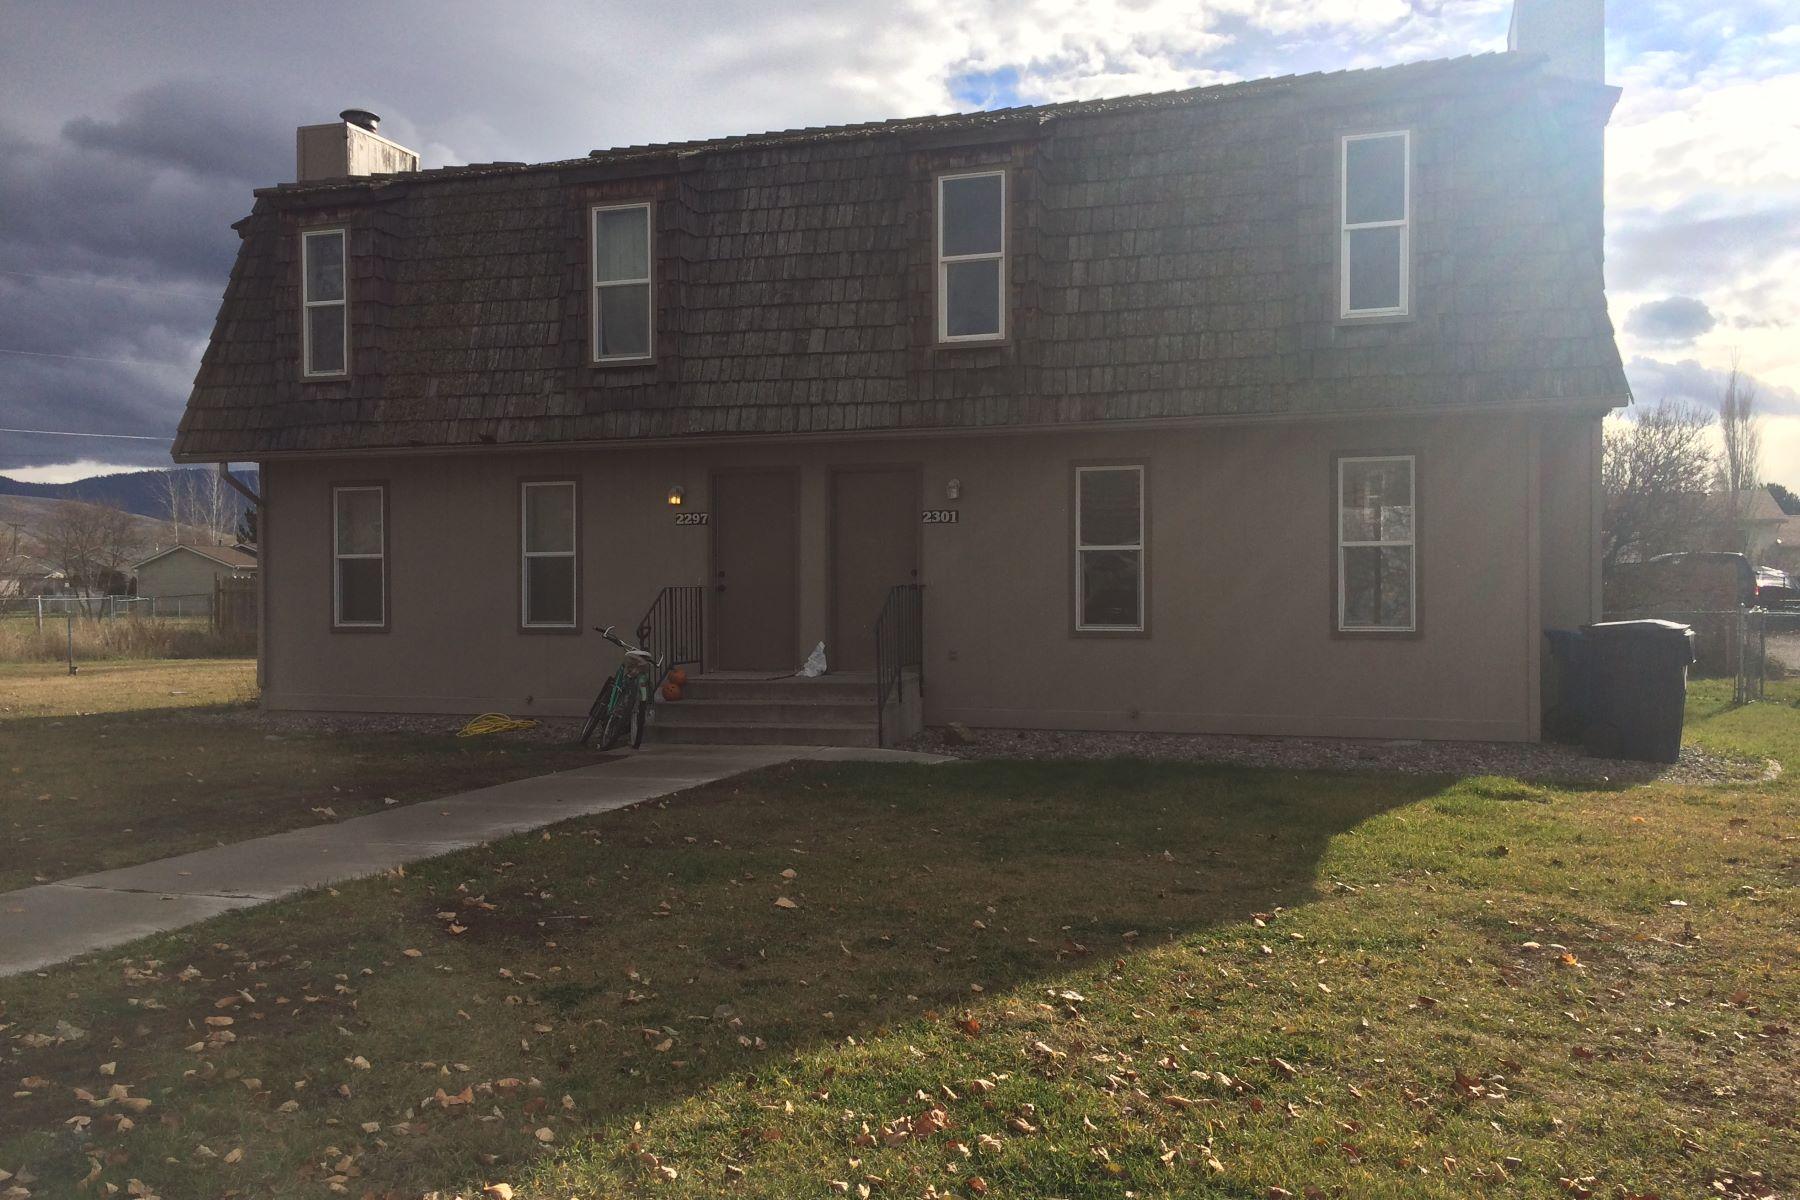 Multi-Family Home for Sale at 2297 Sherwood Lane, Missoula, MT 59801 2297 Sherwood Ln Missoula, Montana 59801 United States